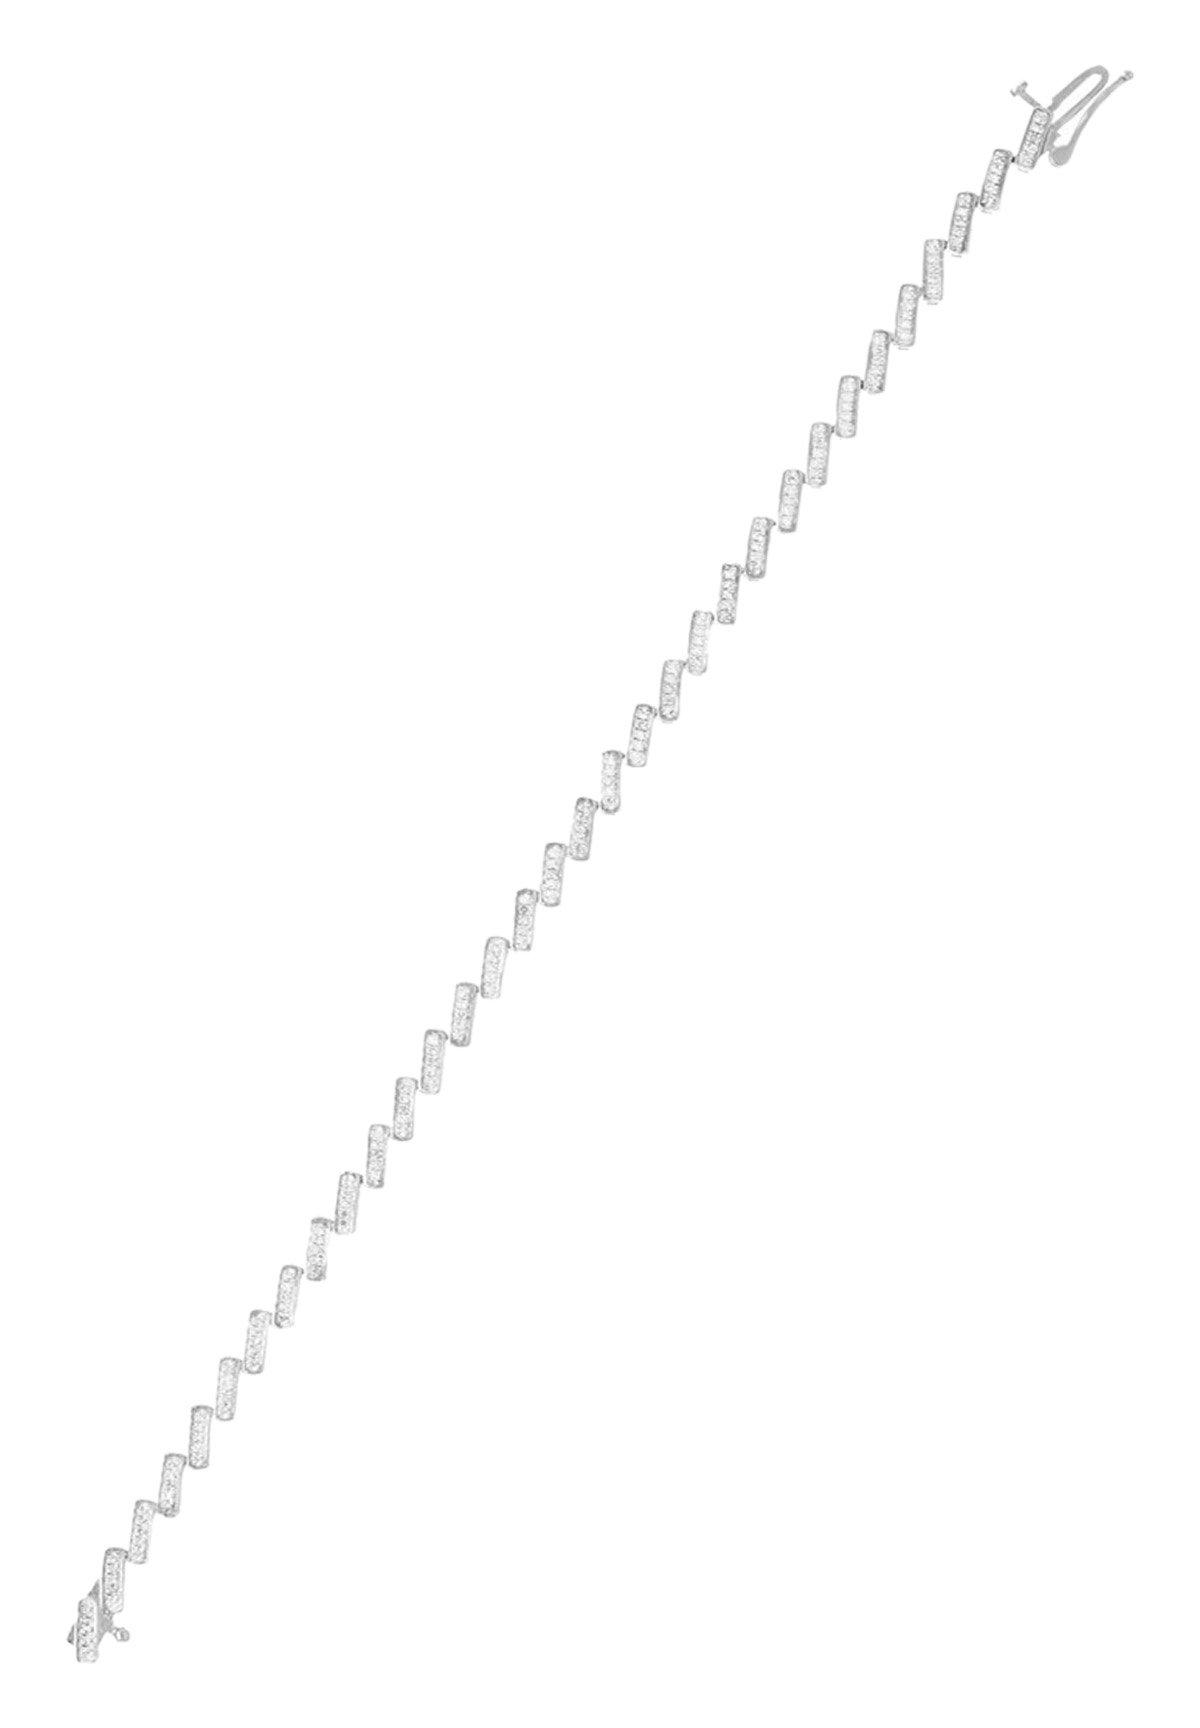 Damen 9K WHITE GOLD BRACELET  CERTIFIED 165 DIAMONDS HP1 0.5 CT - Armband